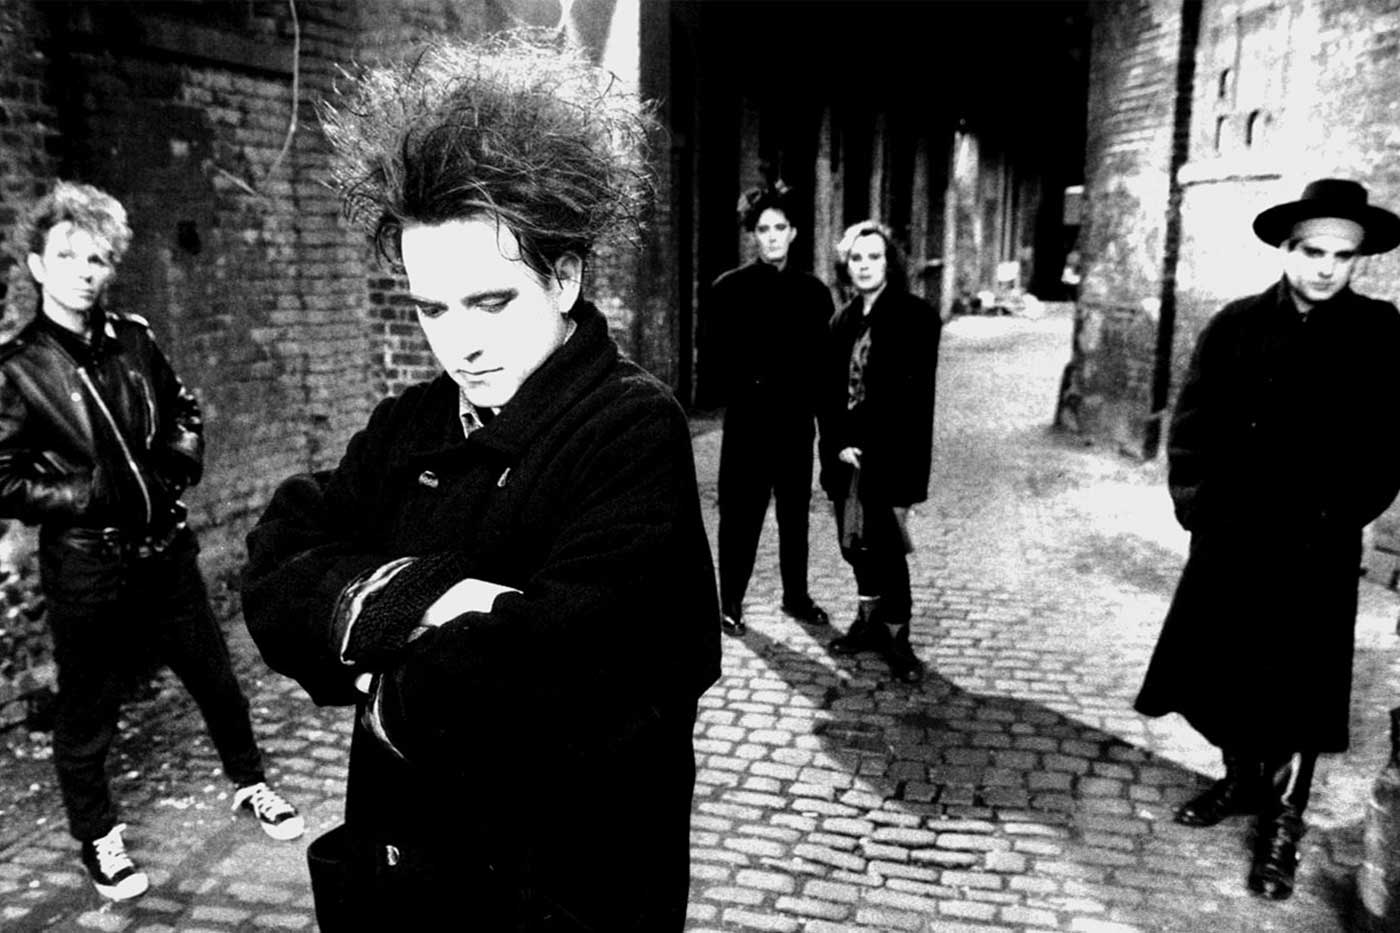 """Disintegration"" de The Cure tres décadas después"